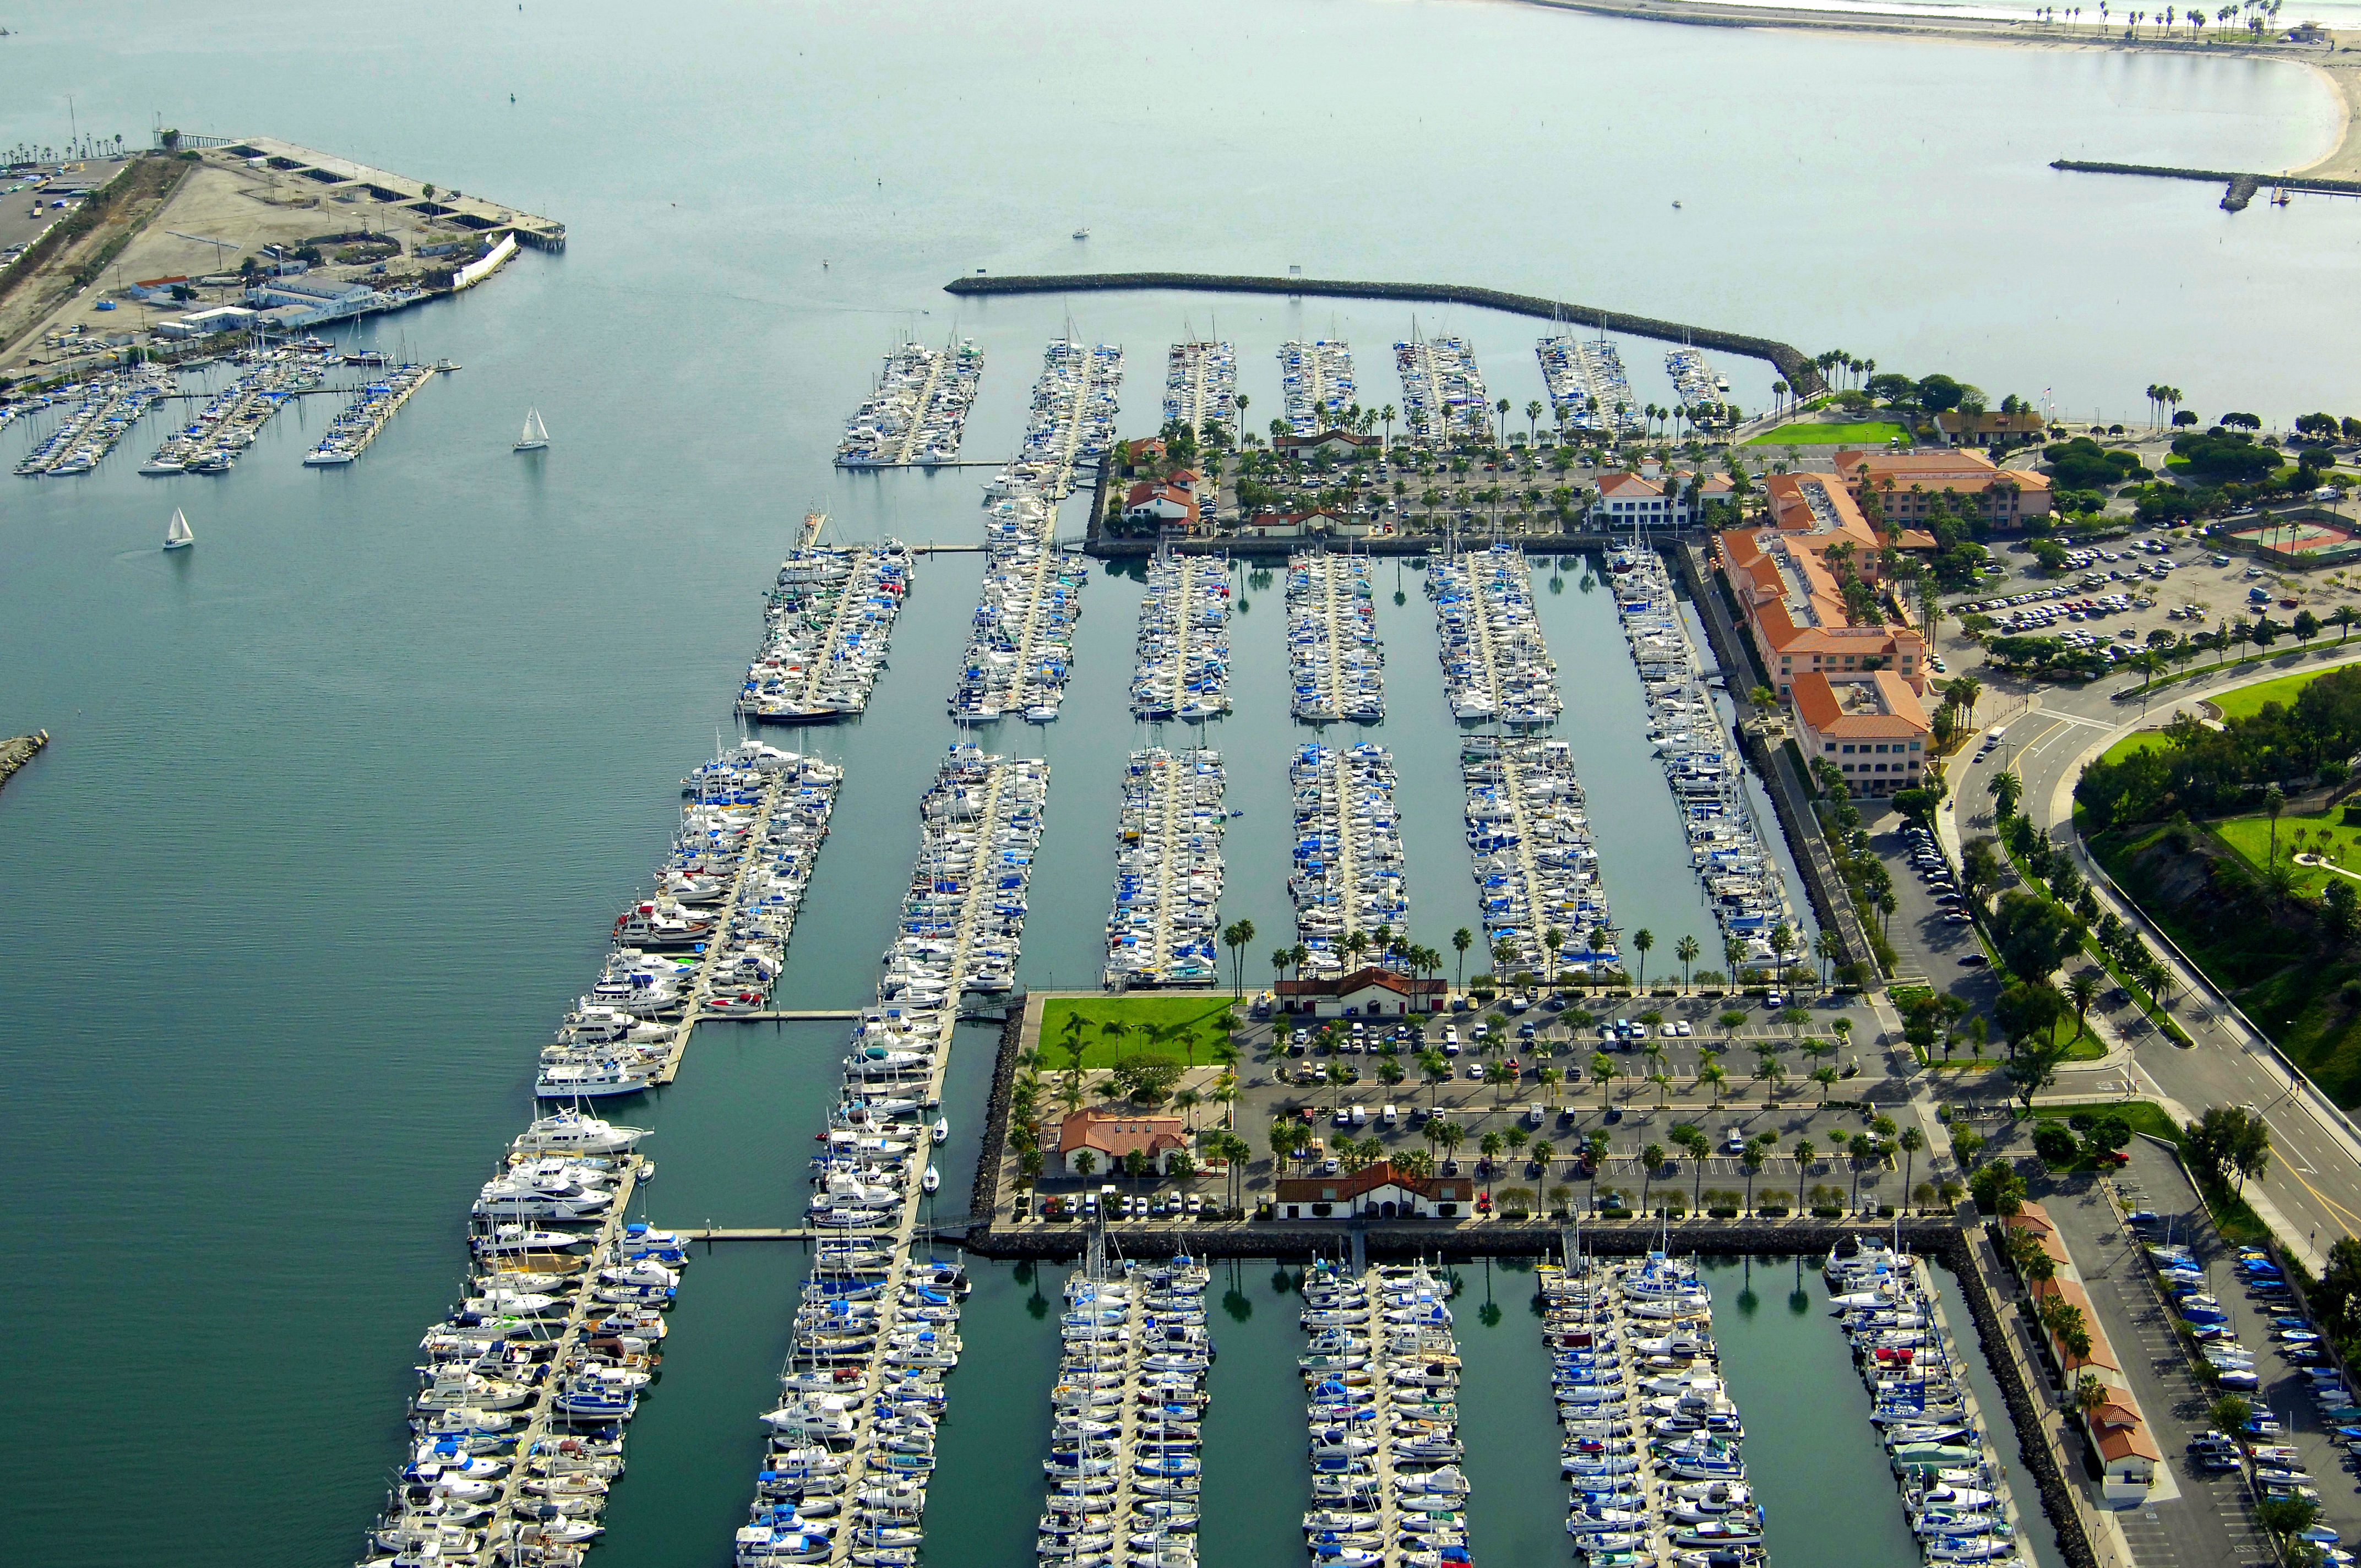 cabrillo marina a california yacht marina in san pedro ca united